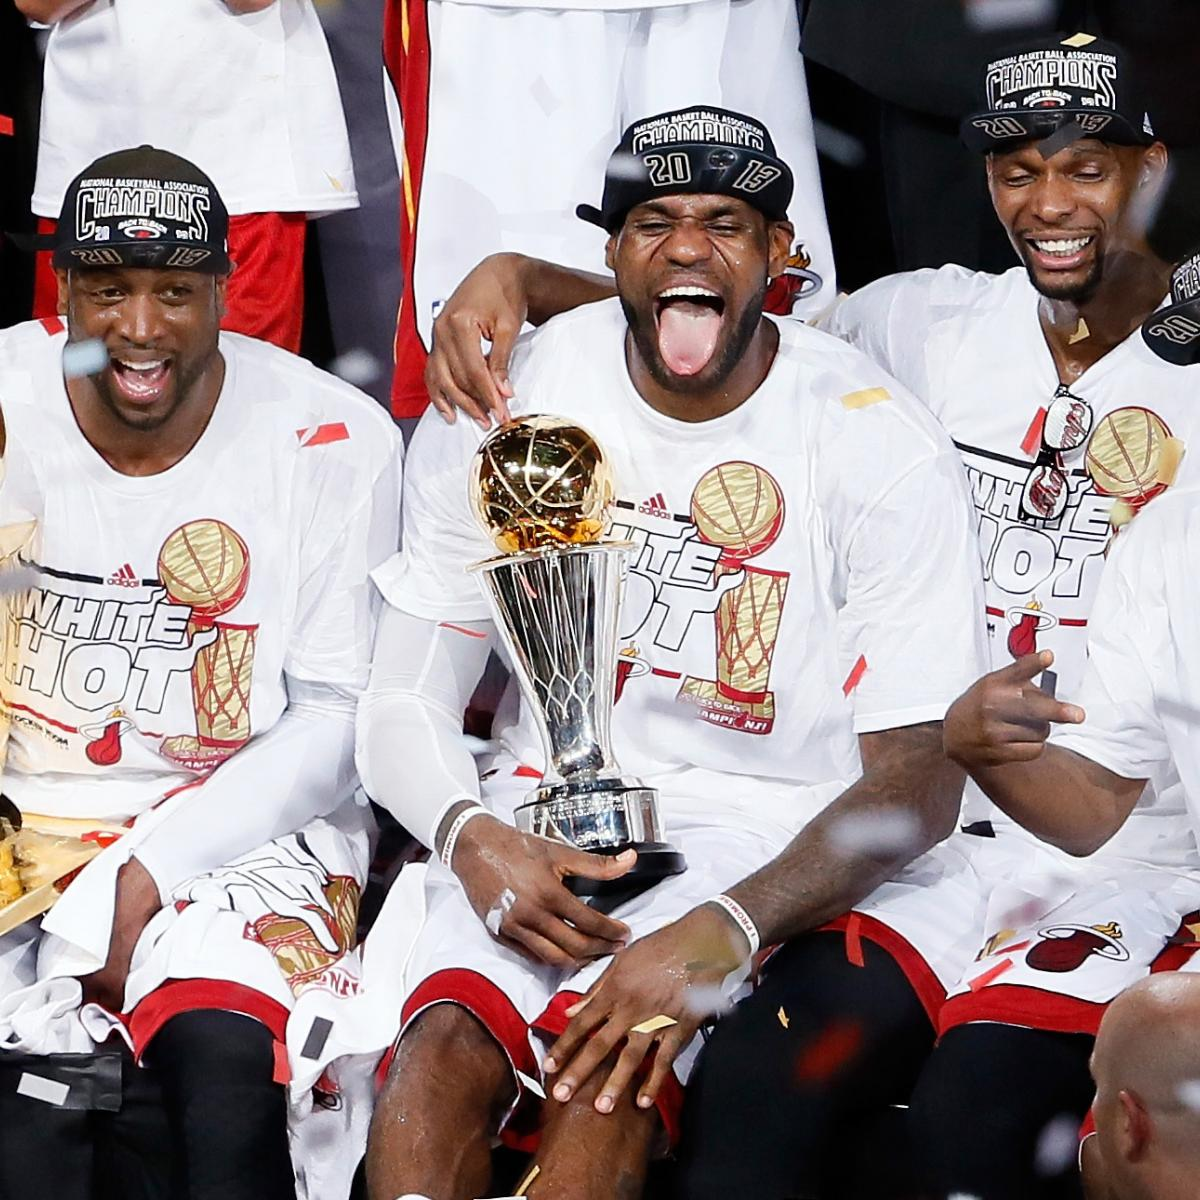 The Miami Heat Celebrate As 2013 NBA Champions